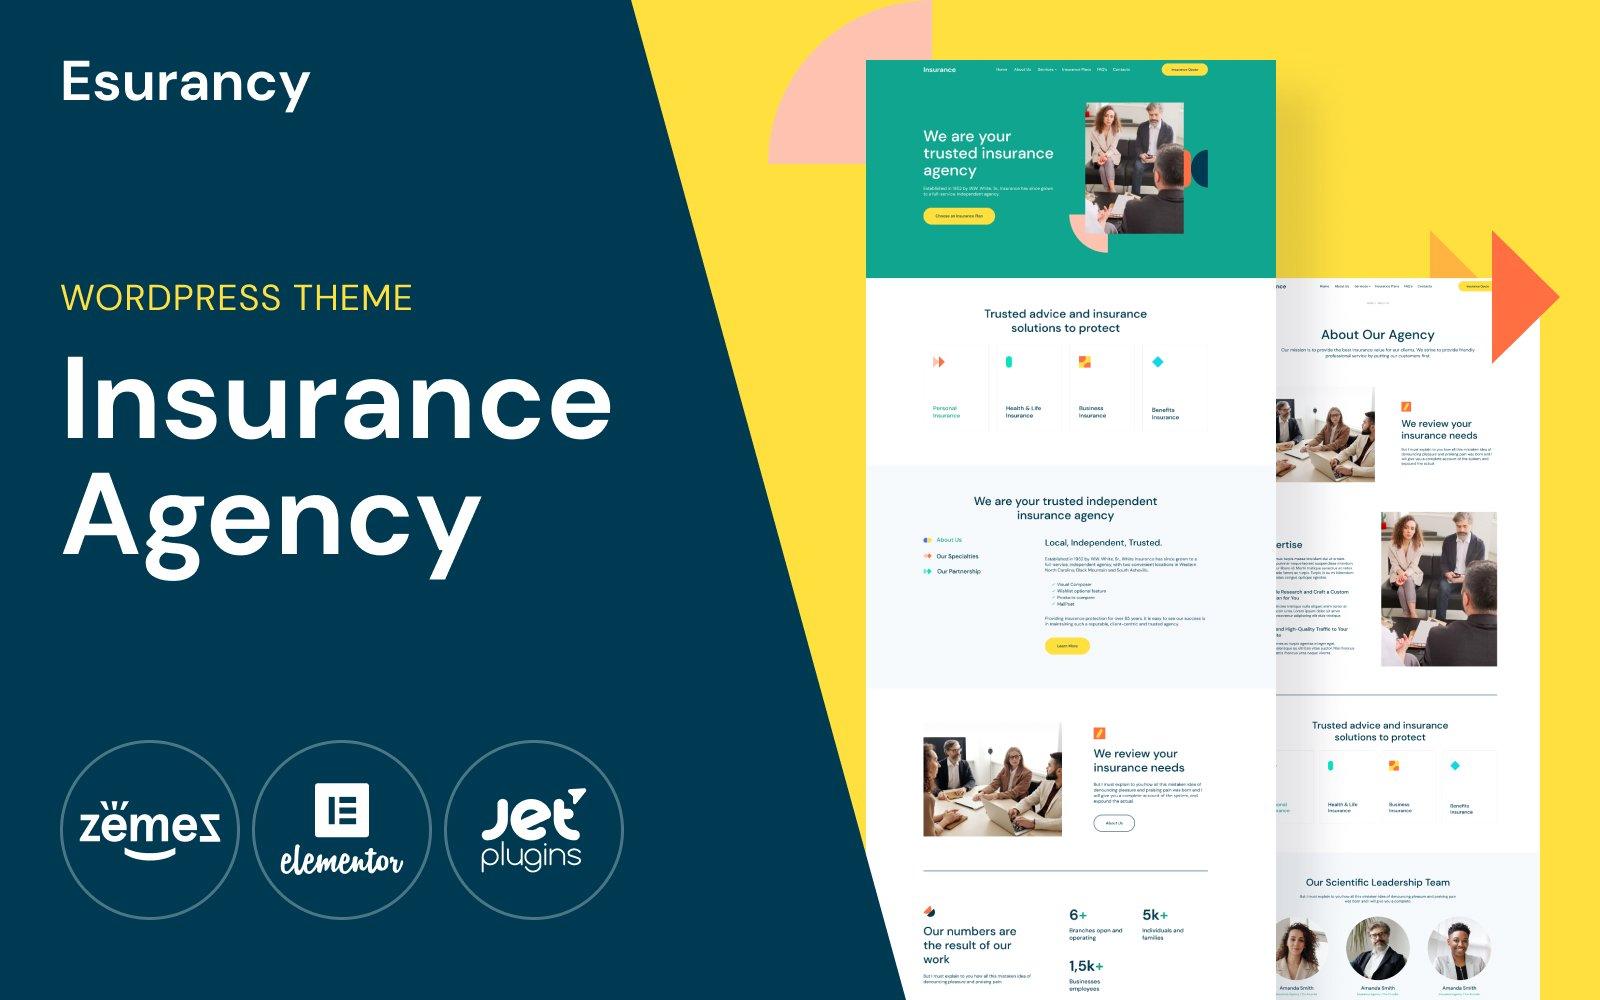 Esurancy - Insurance Agency Services WordPress Theme